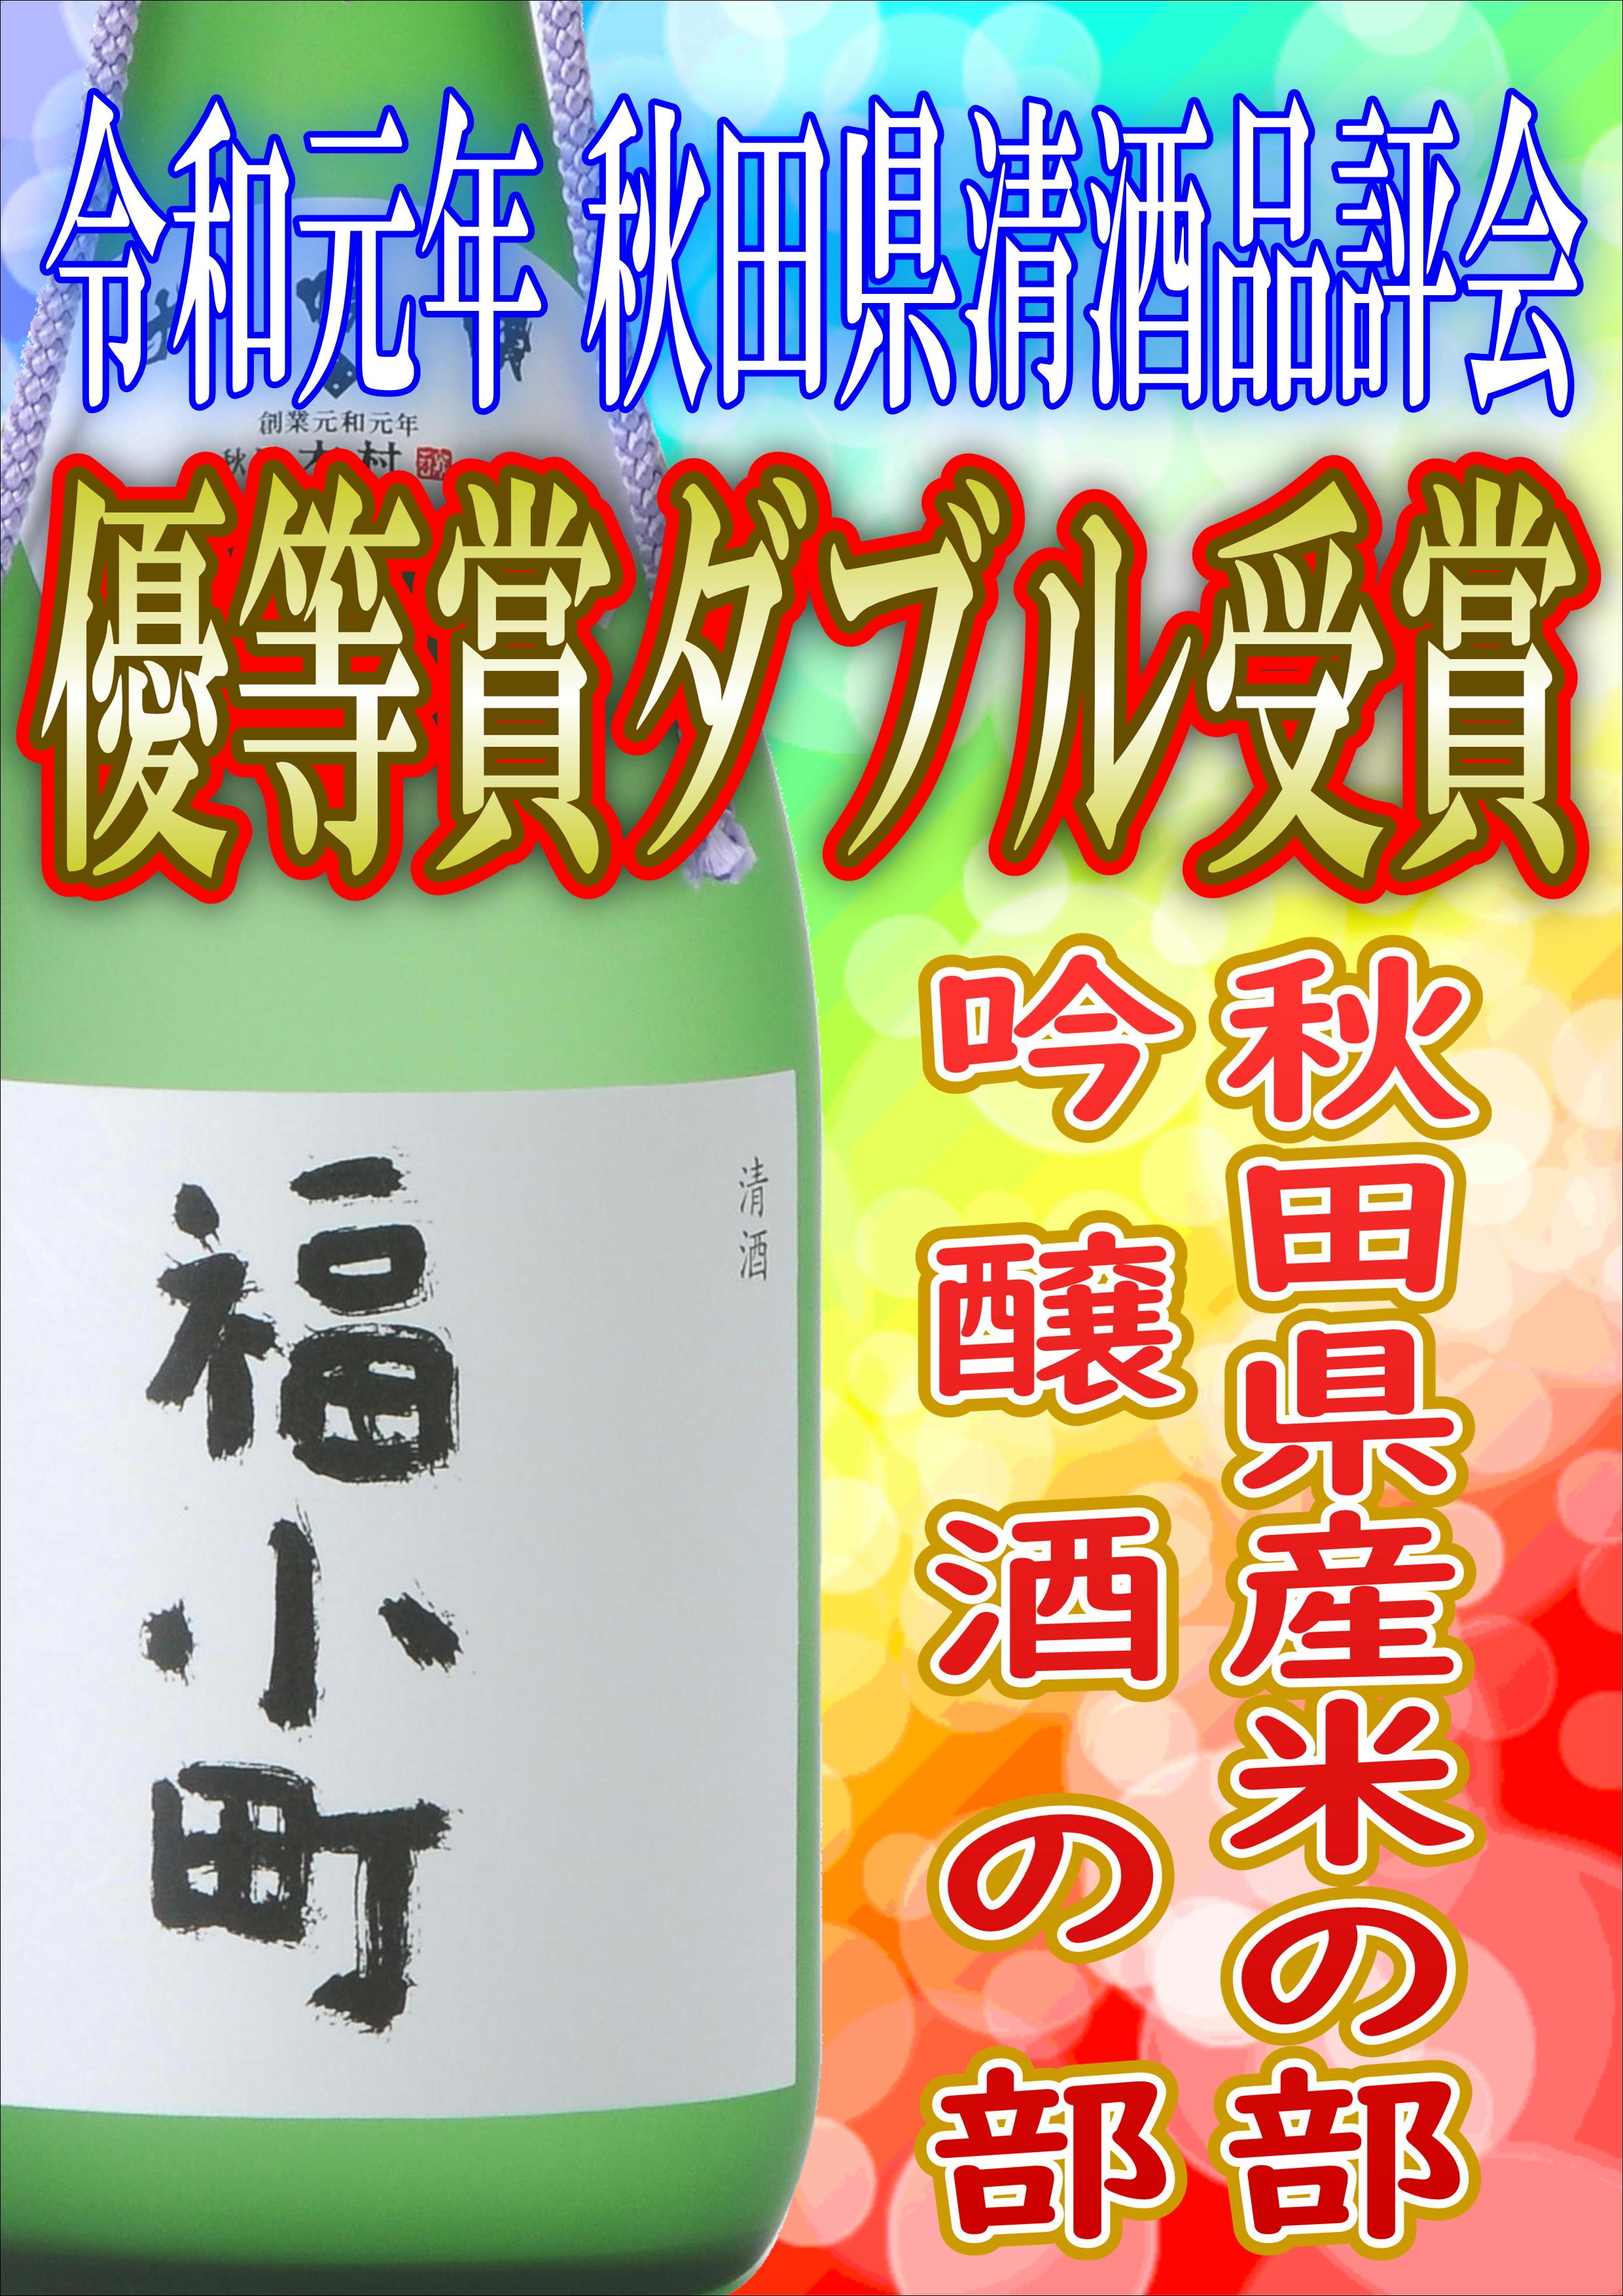 http://www.fukukomachi.com/blog/photo/R1%E7%A7%8B%E7%94%B0%E7%9C%8C%E5%93%81%E8%A9%95%E4%BC%9A.JPG